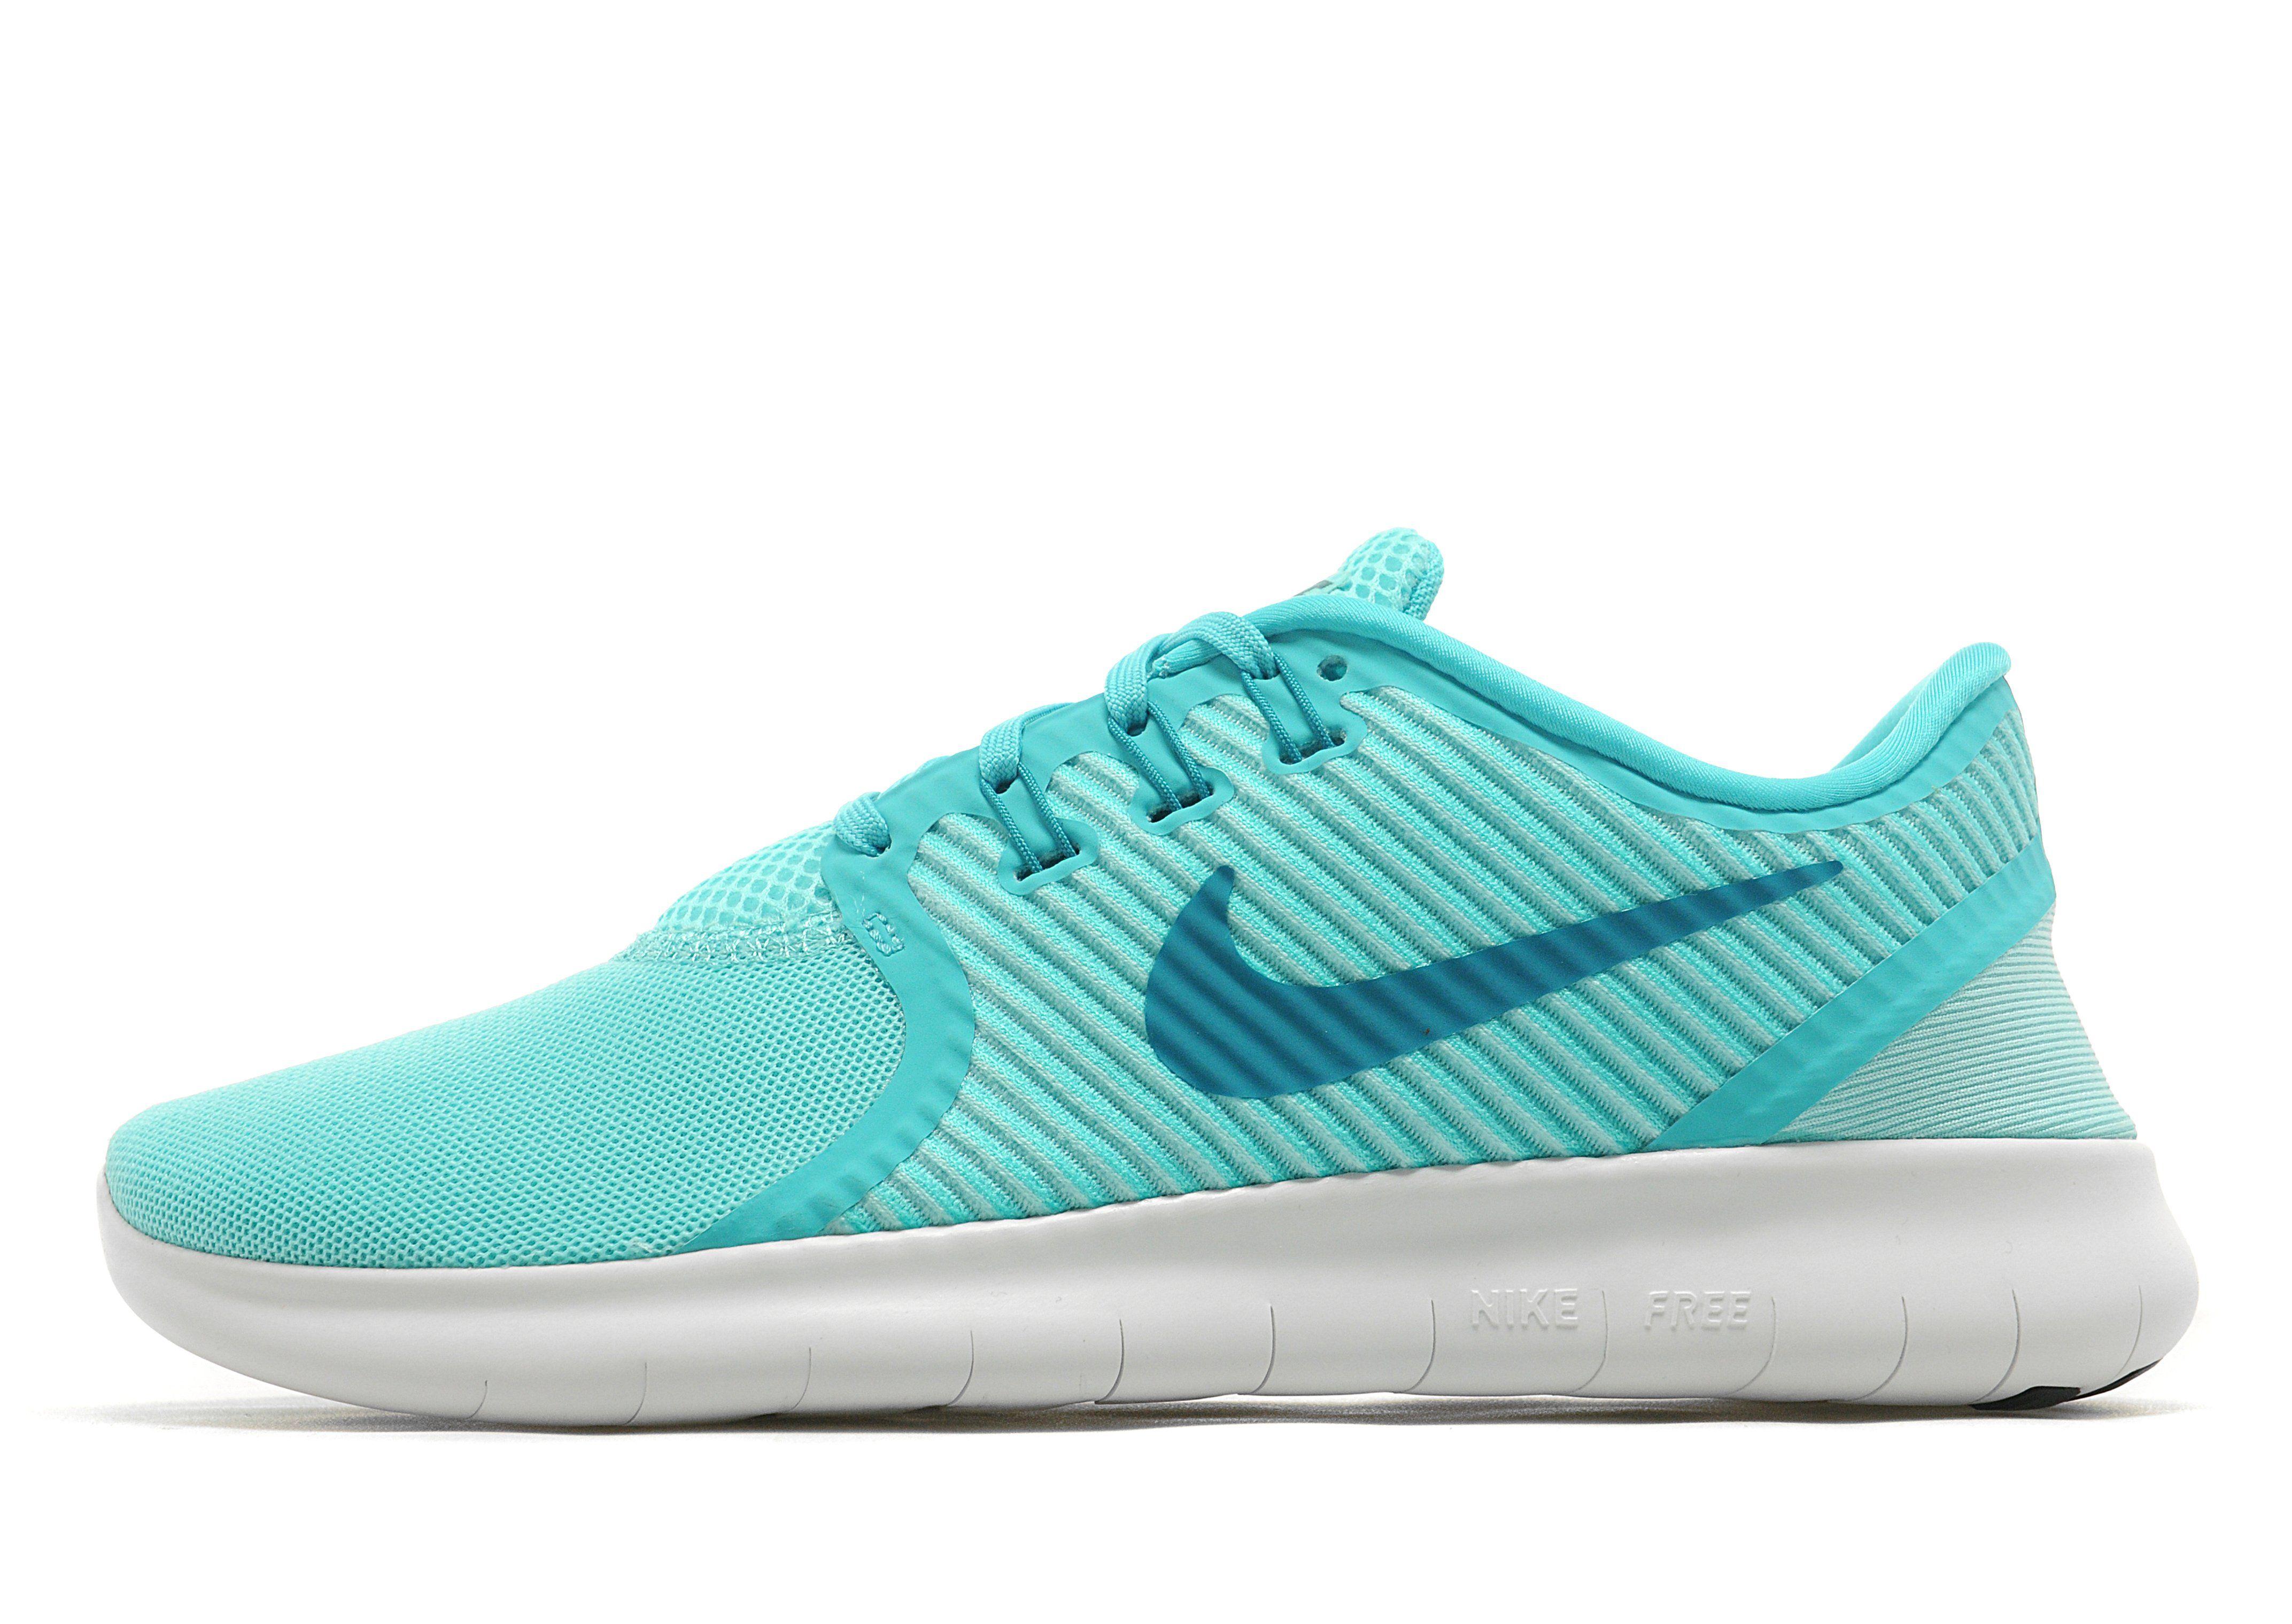 ... Nike Free Runs Jd Sports; Nike Free Run ...